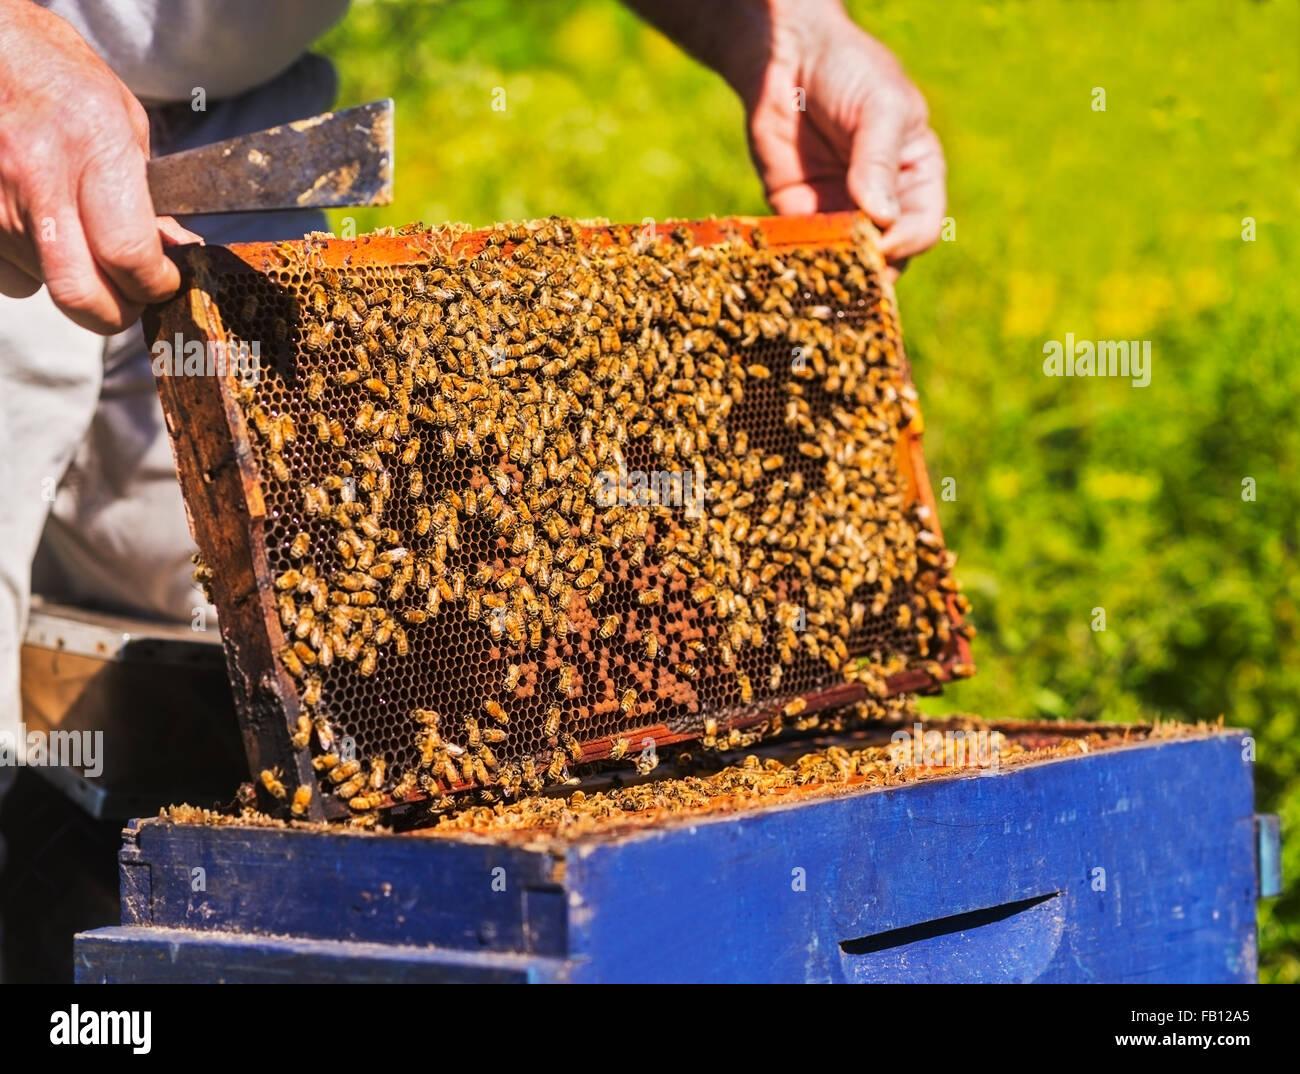 Beekeeper with beeswax honeycomb frame - Stock Image